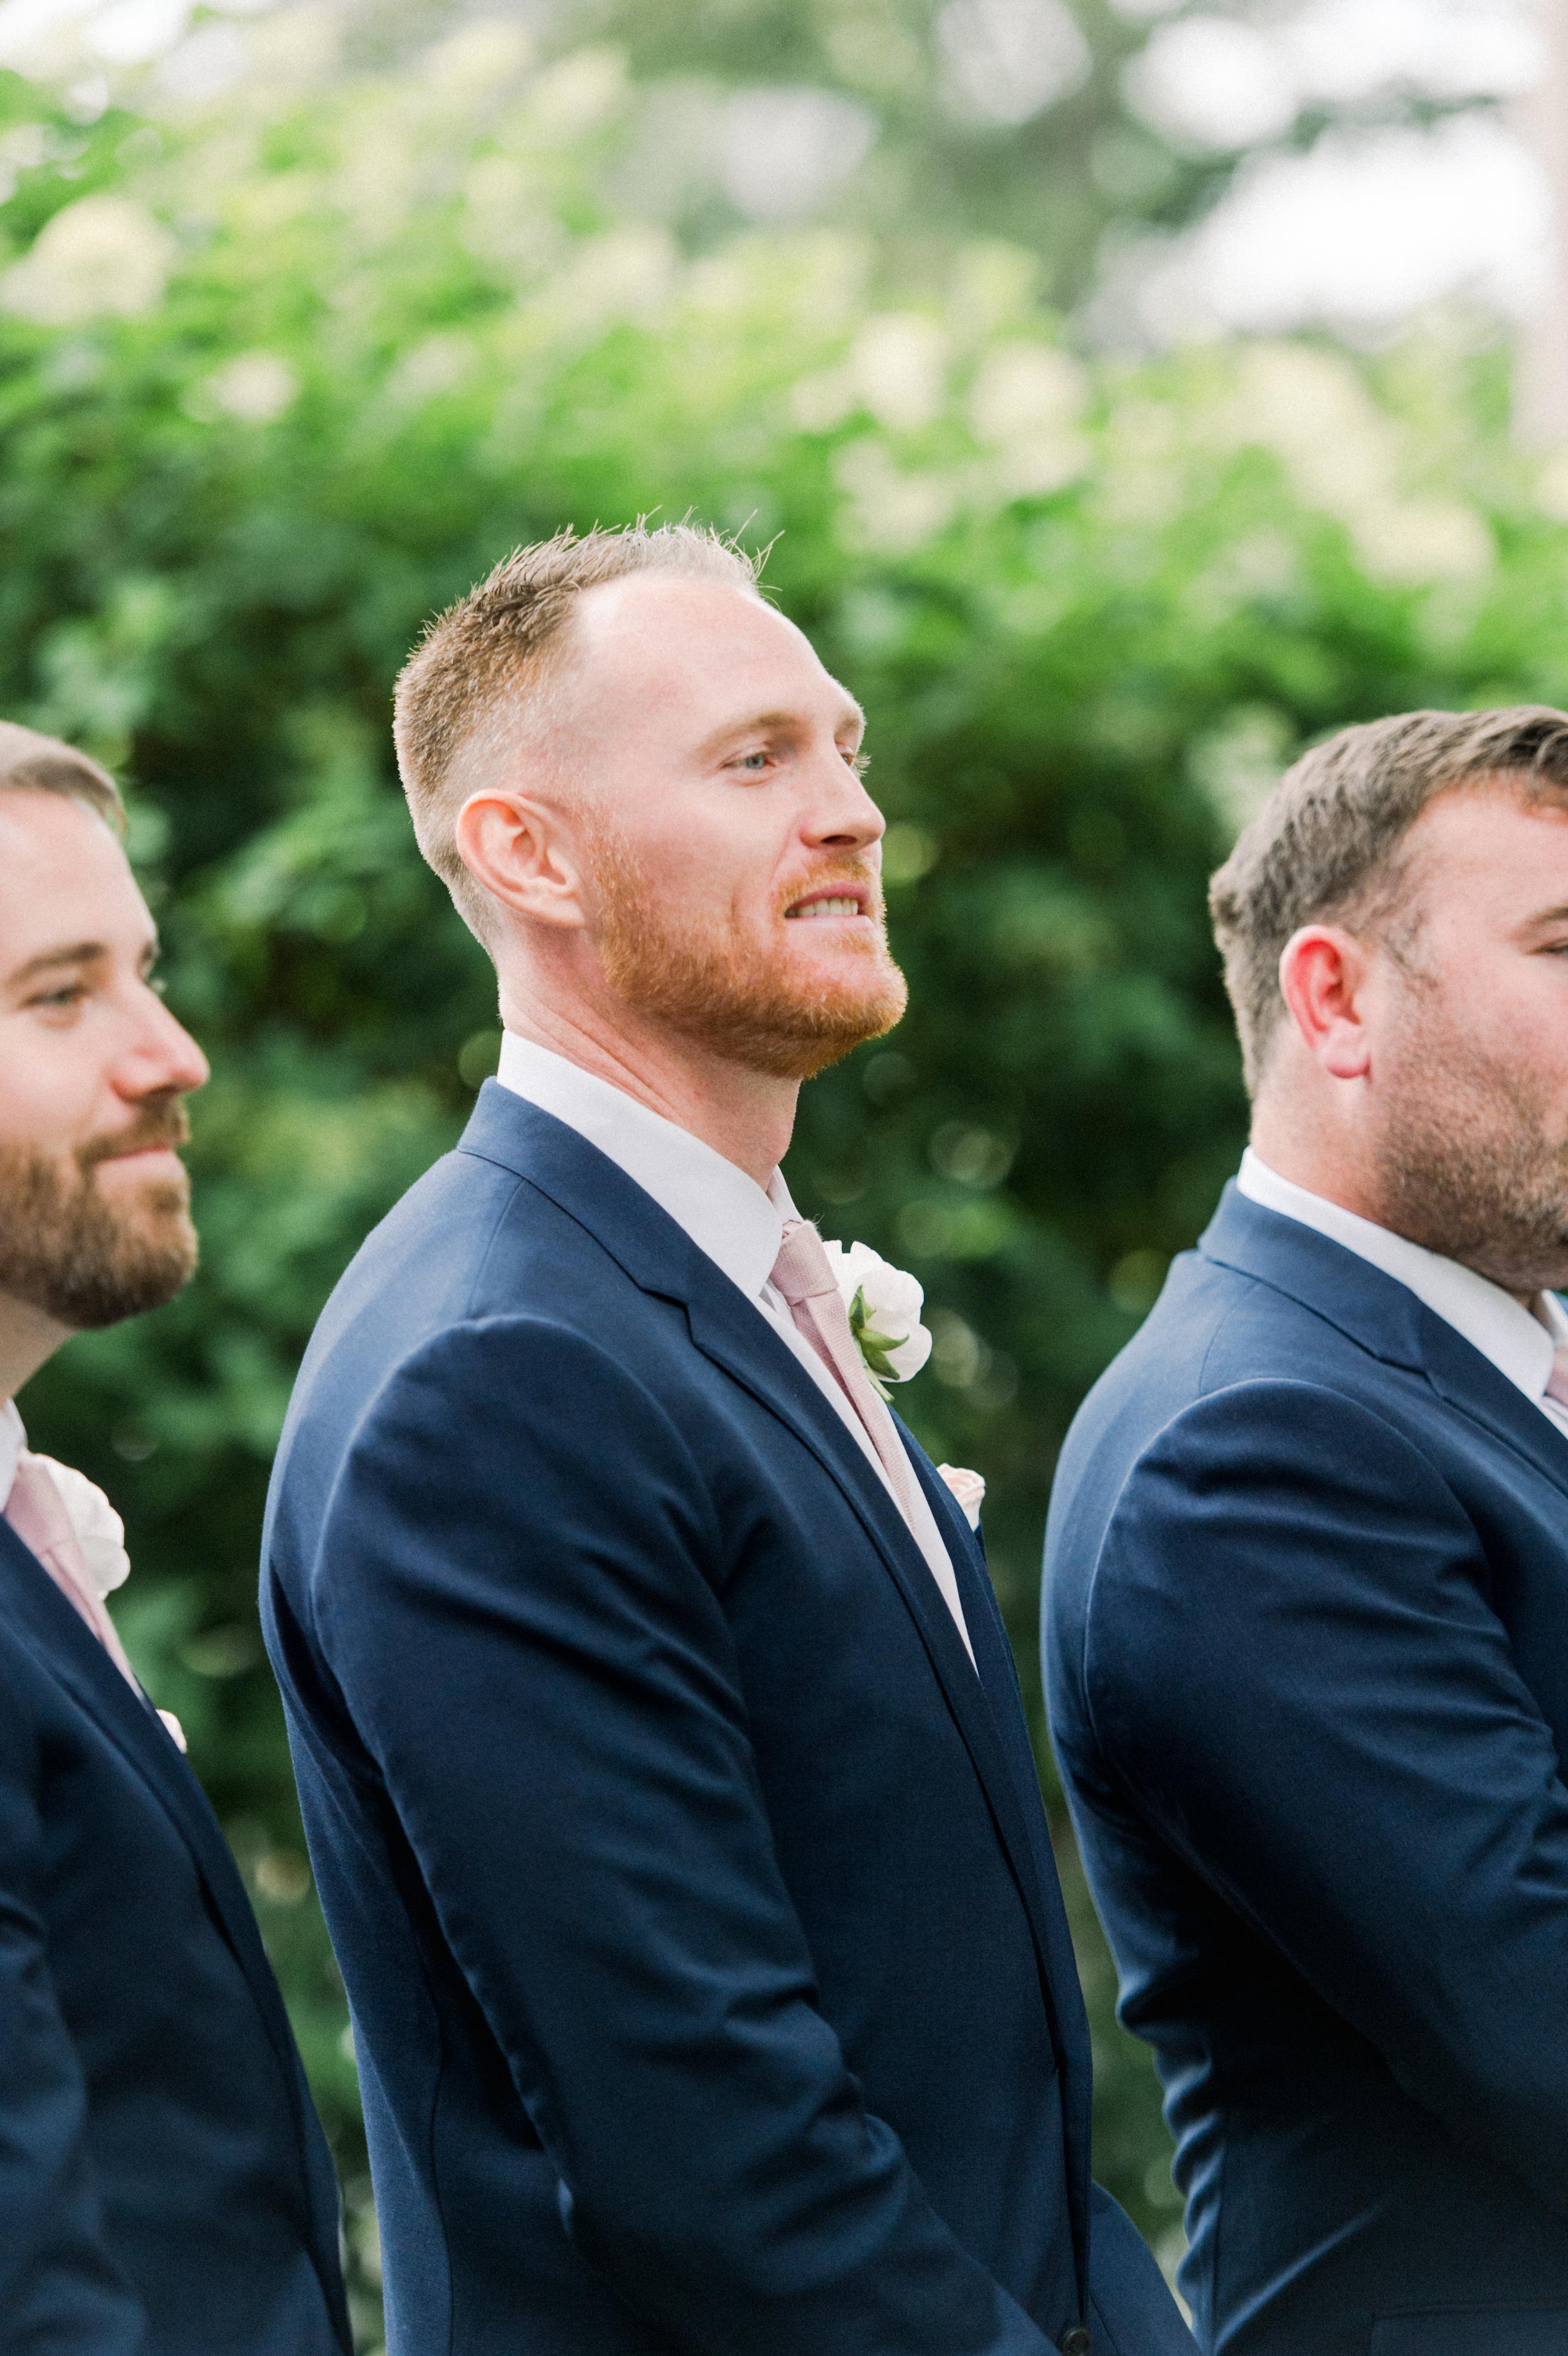 The Commons 1854 Topsfield MA wedding | Massachusetts wedding venue | Massachusetts wedding photos | North Shore MA Wedding photos | groomsmen photos | groomsmen portraits